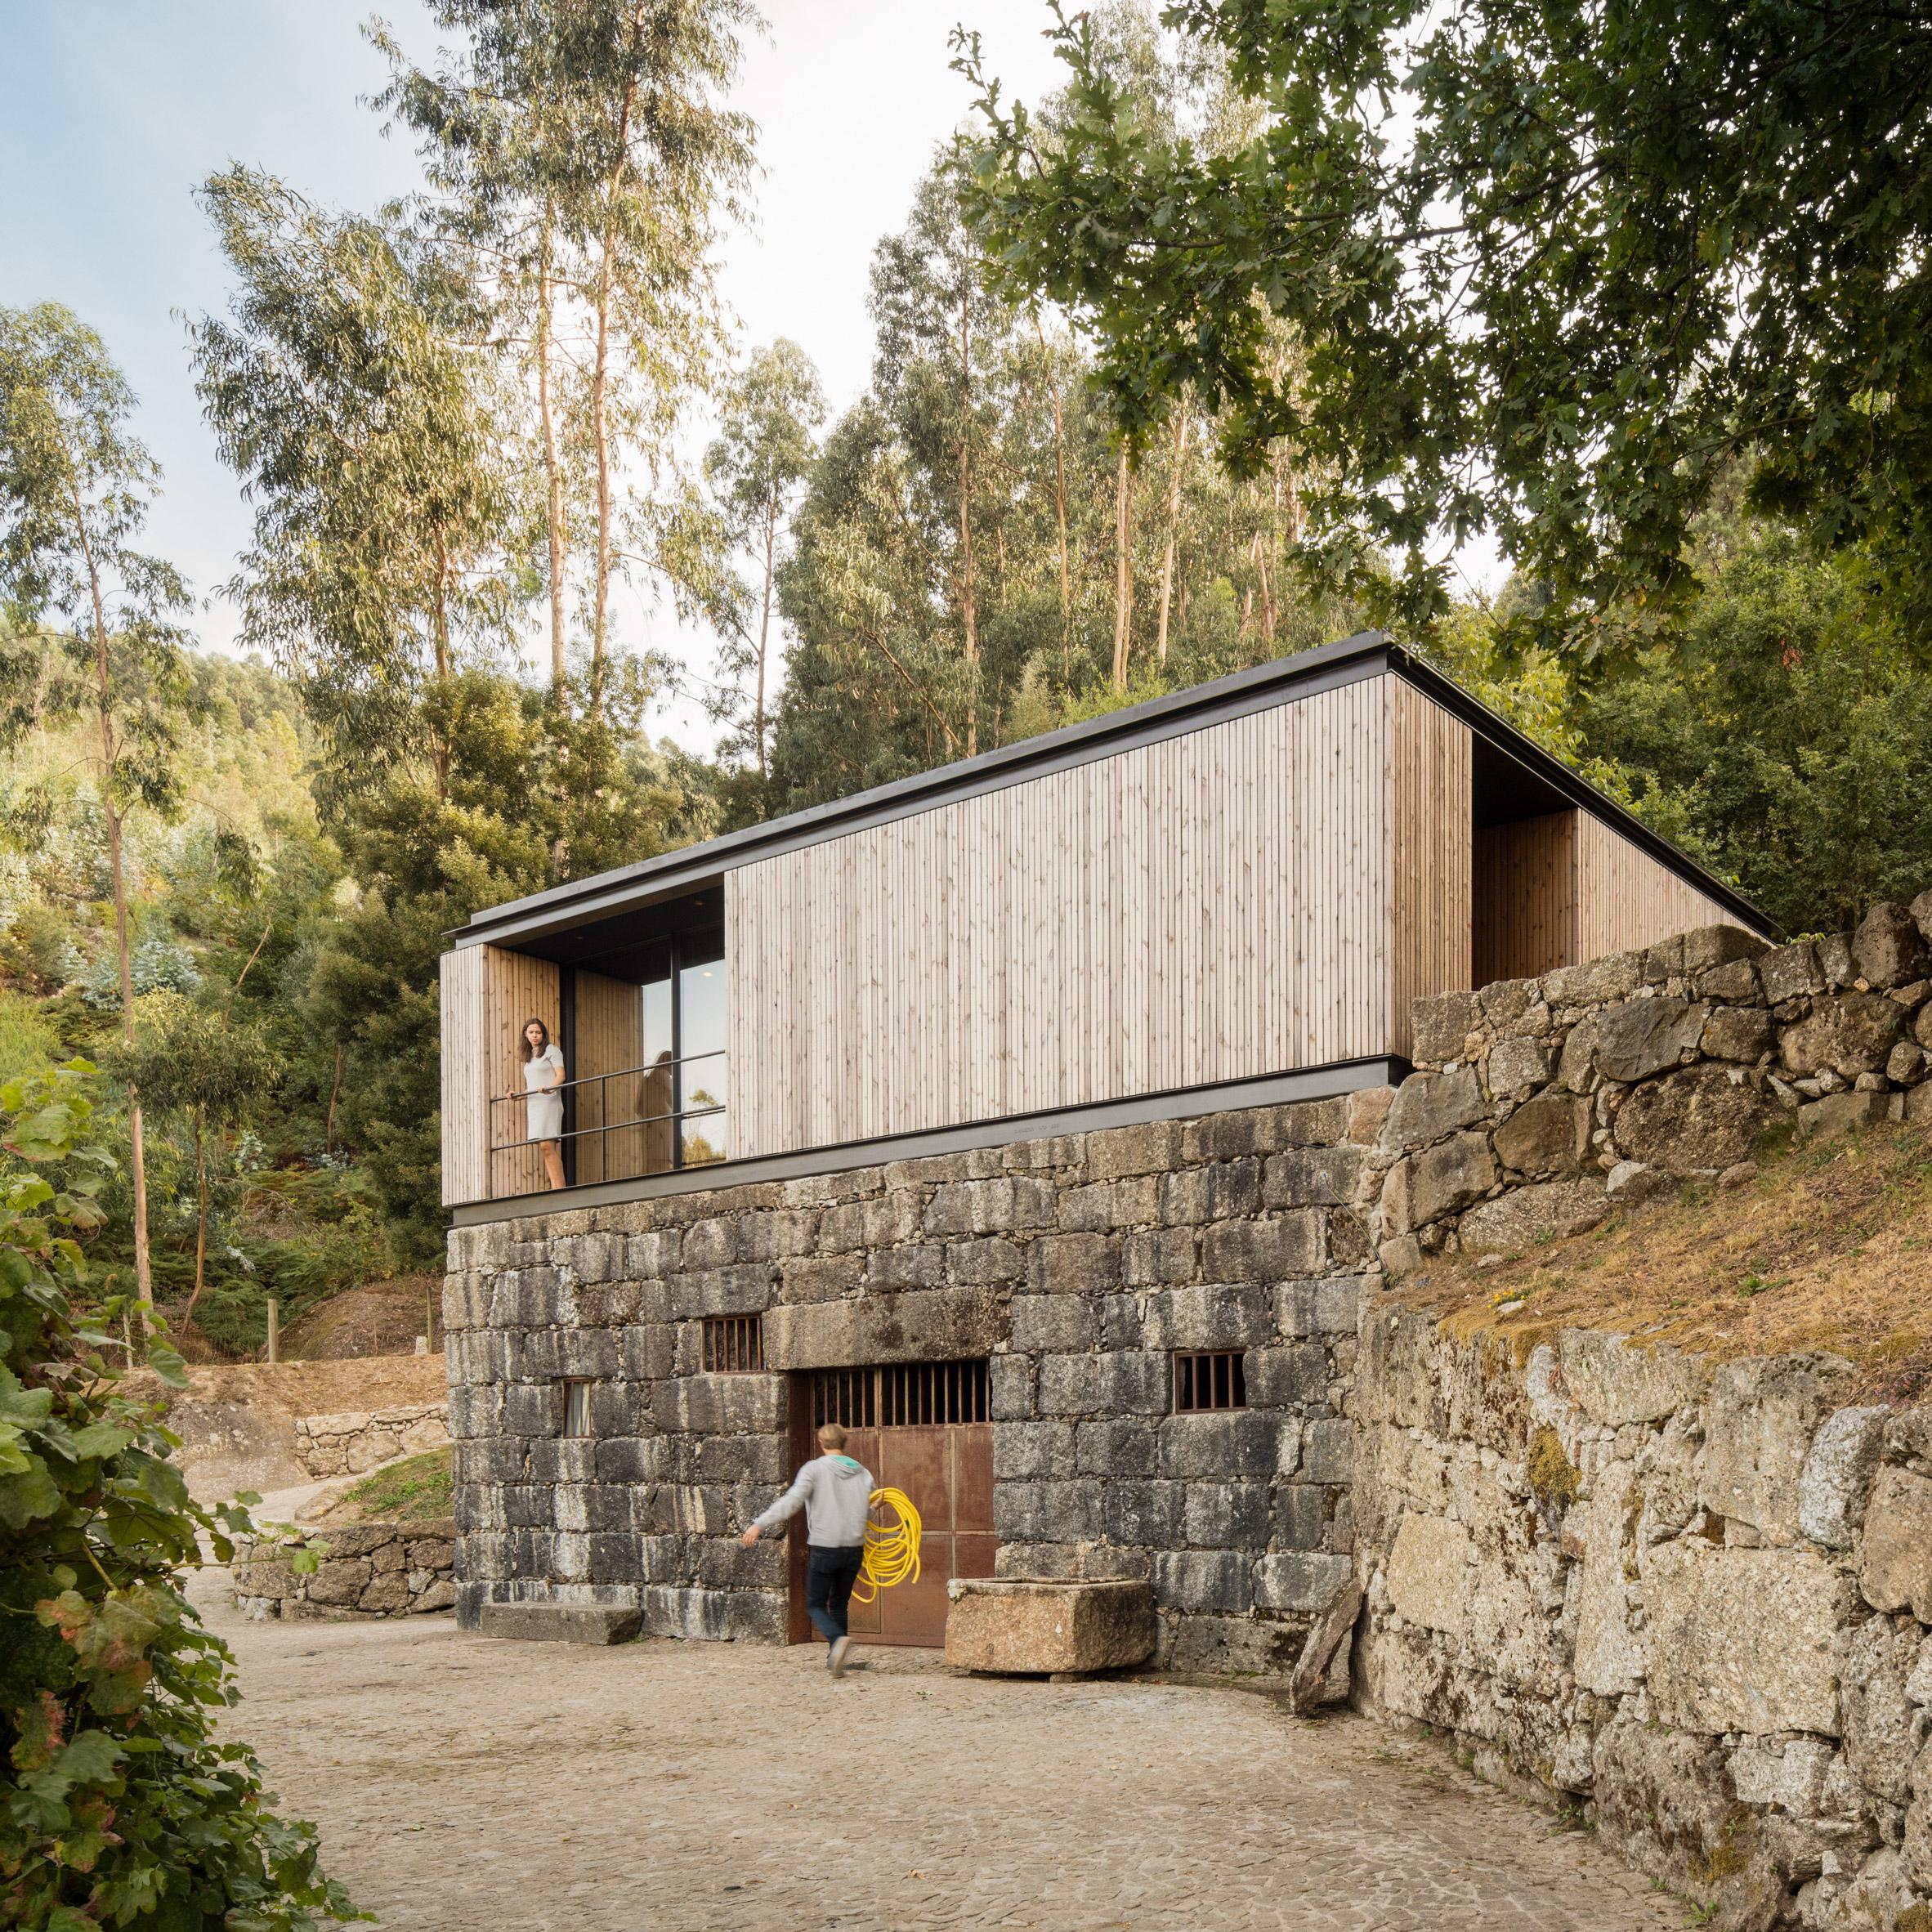 Dezeen's top 10 houses of 2019: Pavilion House by Andreia Garcia Architectural Affairs + Diogo Aguiar Studio